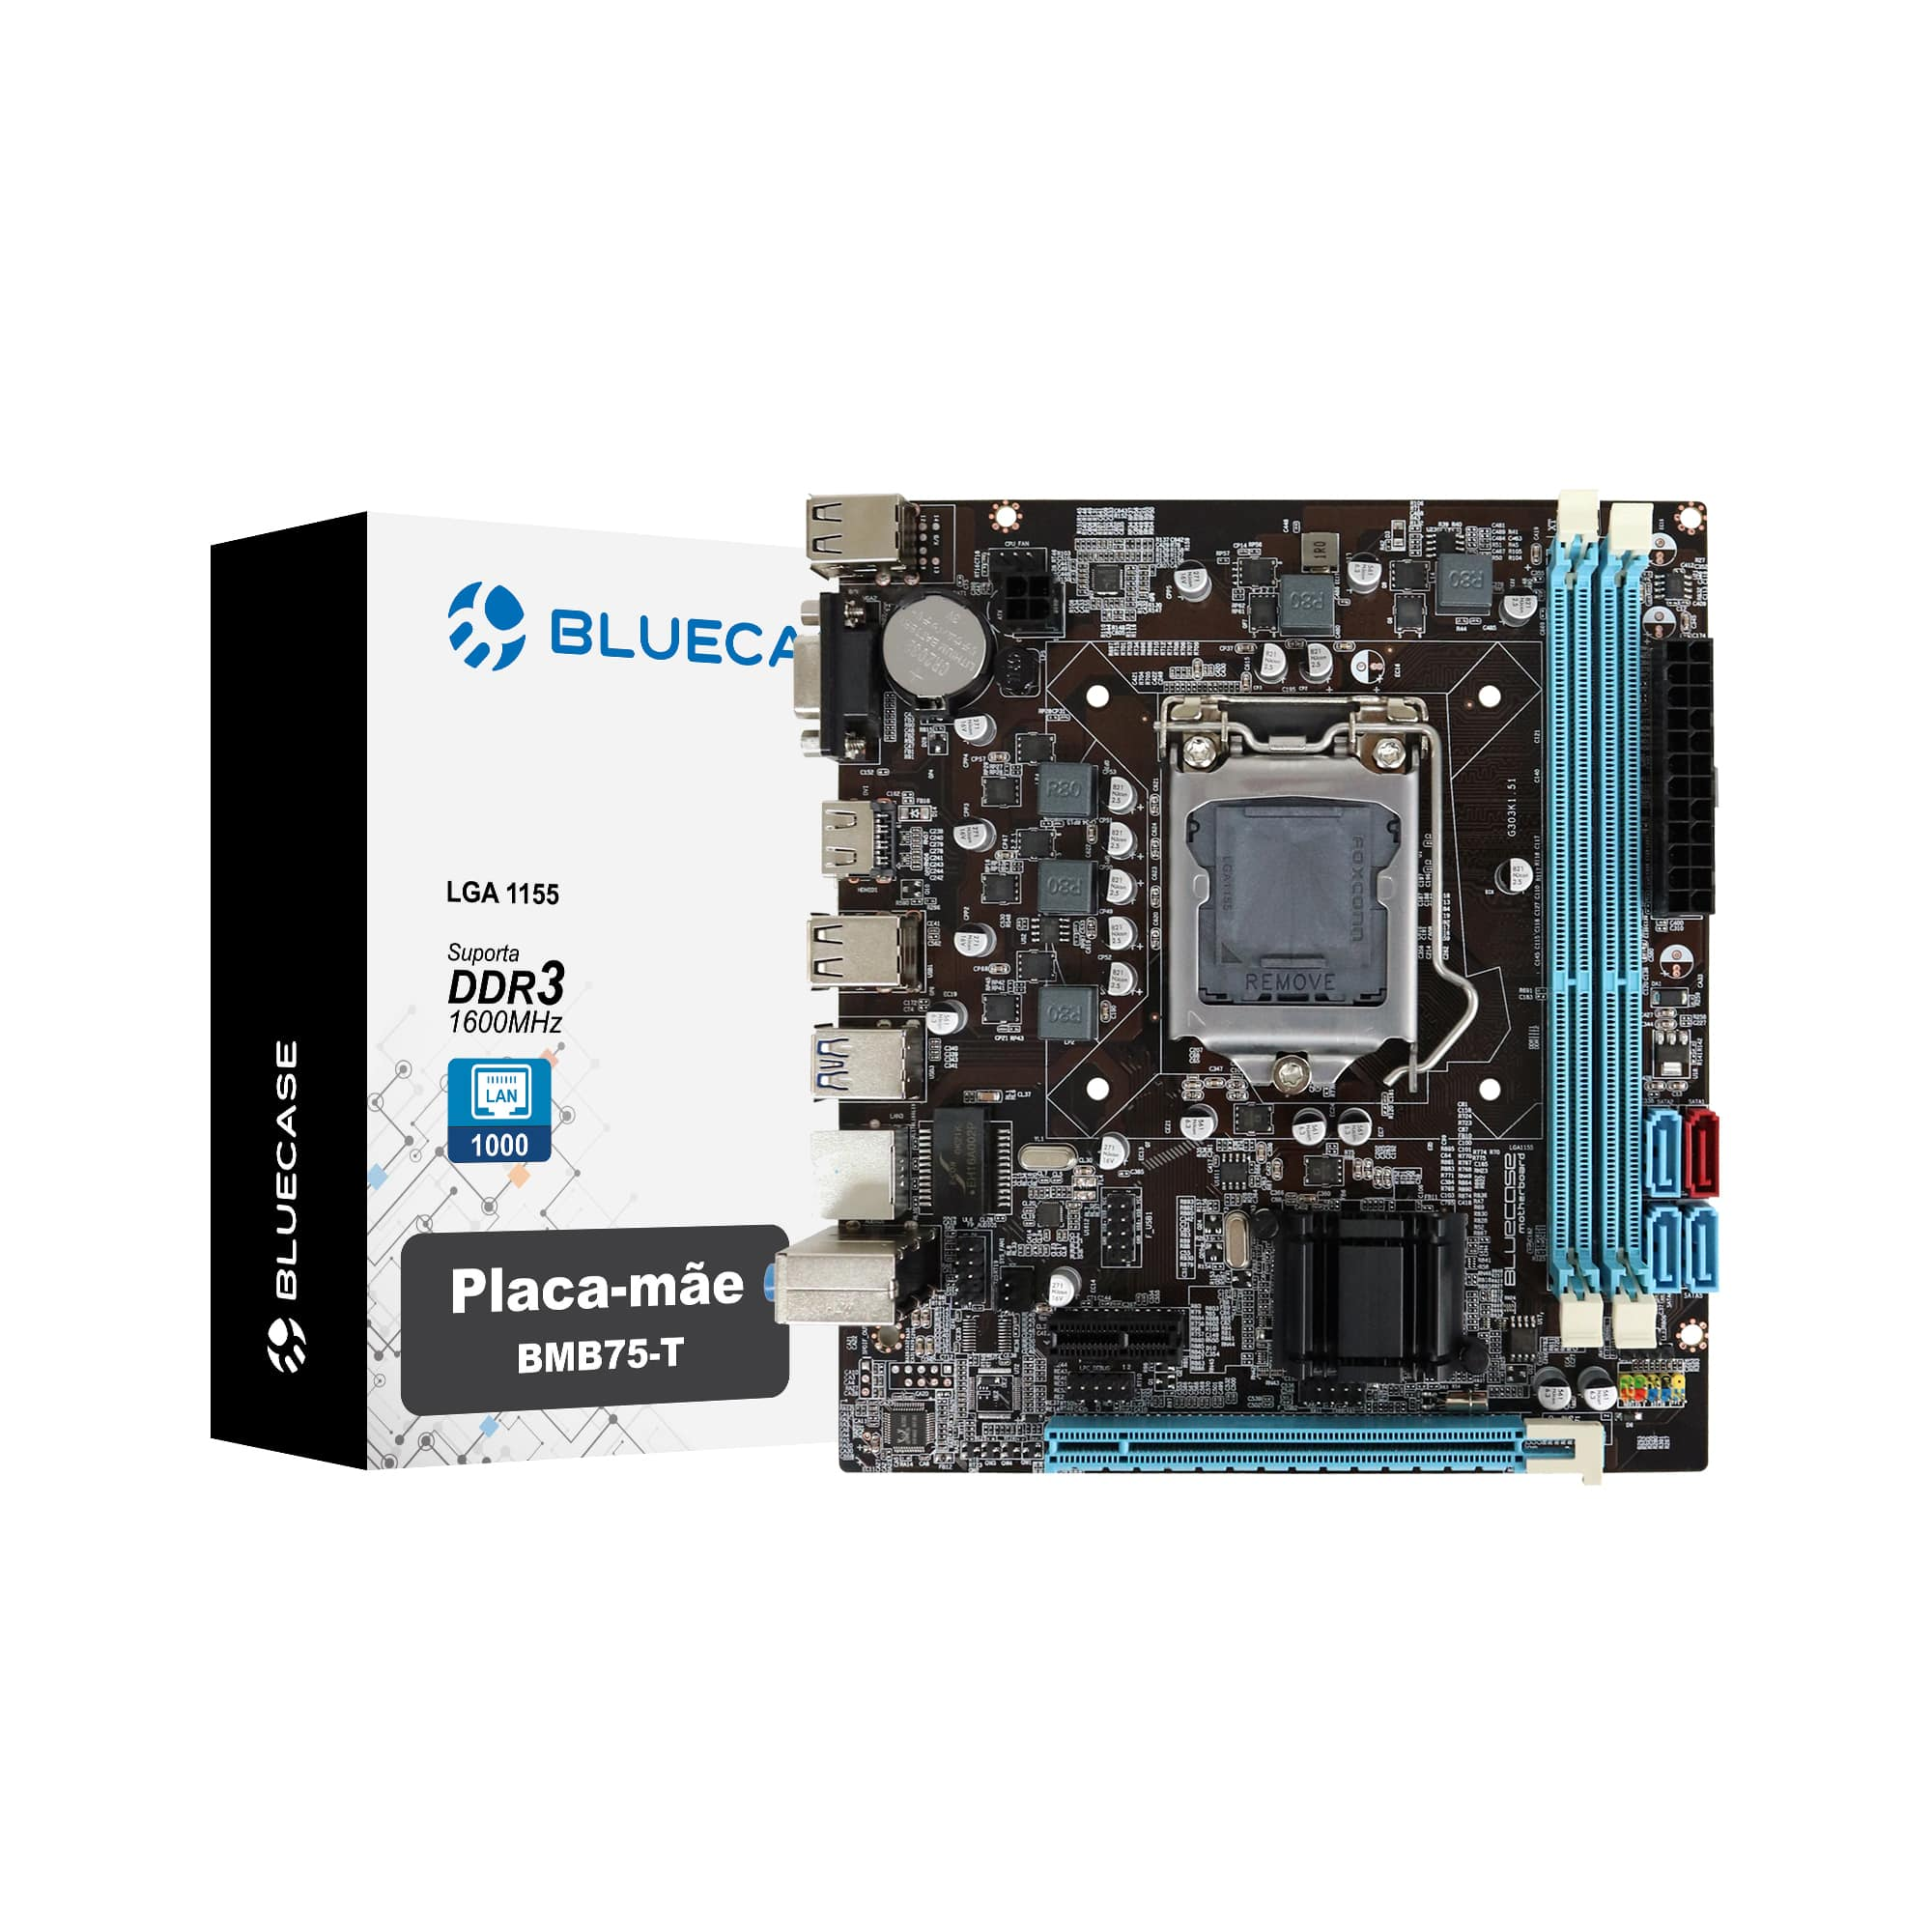 Placa-mãe Bluecase BMB75-T, LGA 1155, DDR3, Gigabit - BMB75TCASE